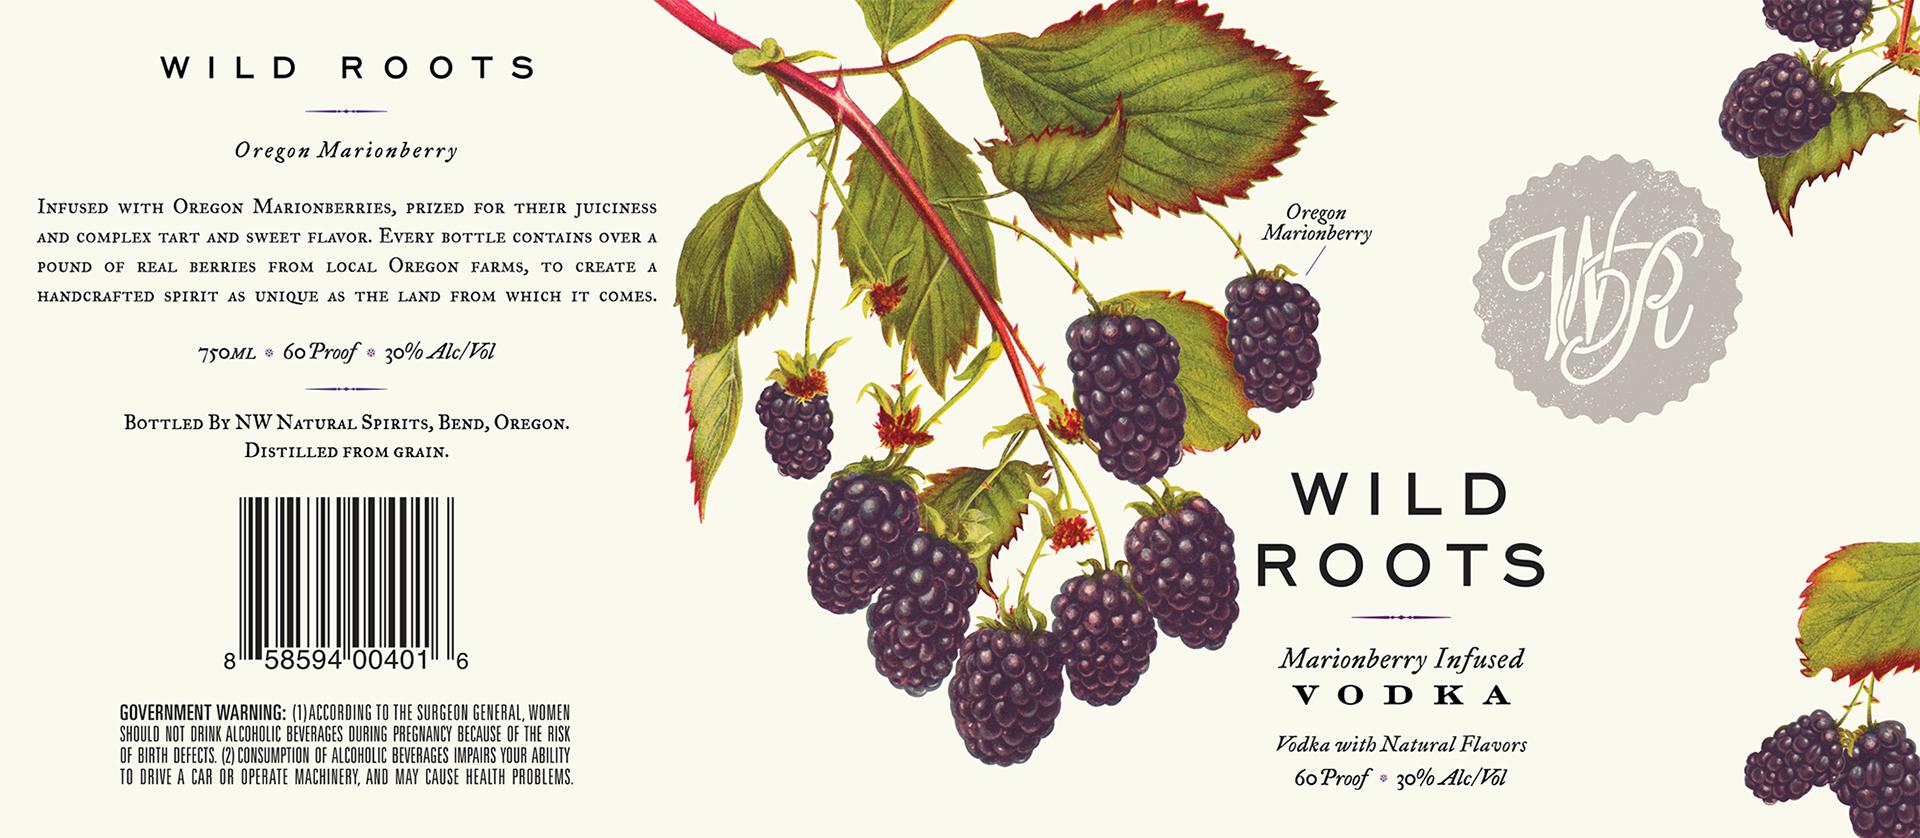 Wild Roots伏特加包装设计 欣赏-第6张